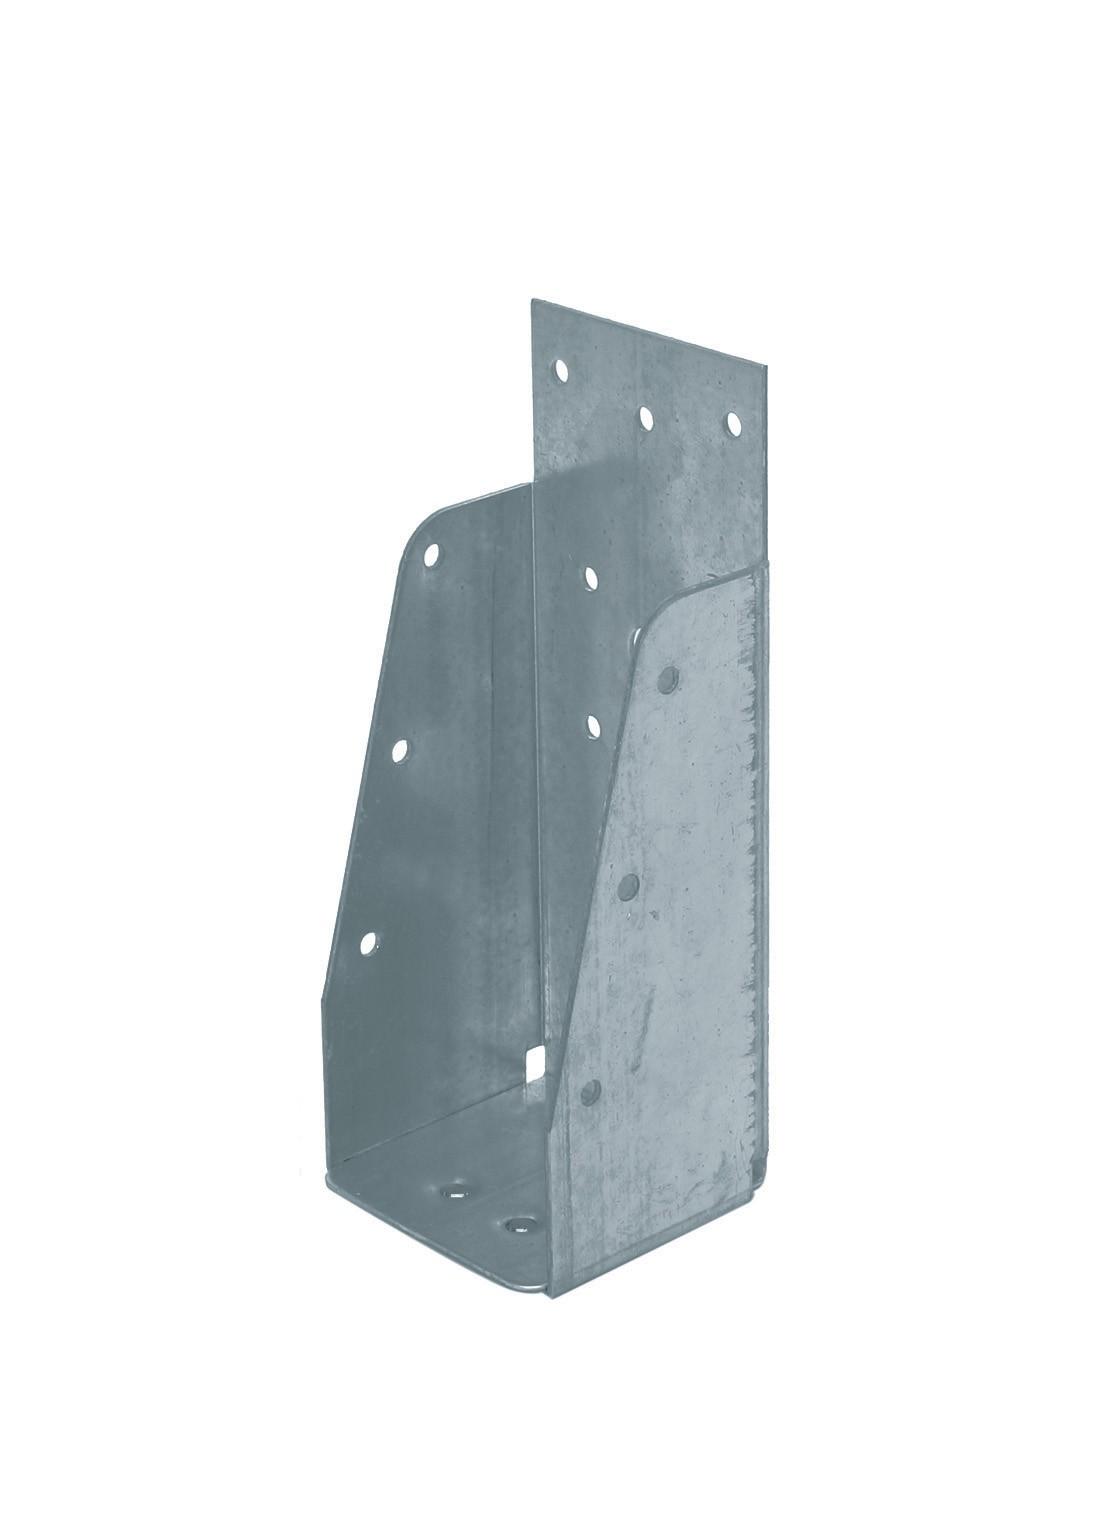 Balkdrager GBS-ZL 63x225 1,5 SV